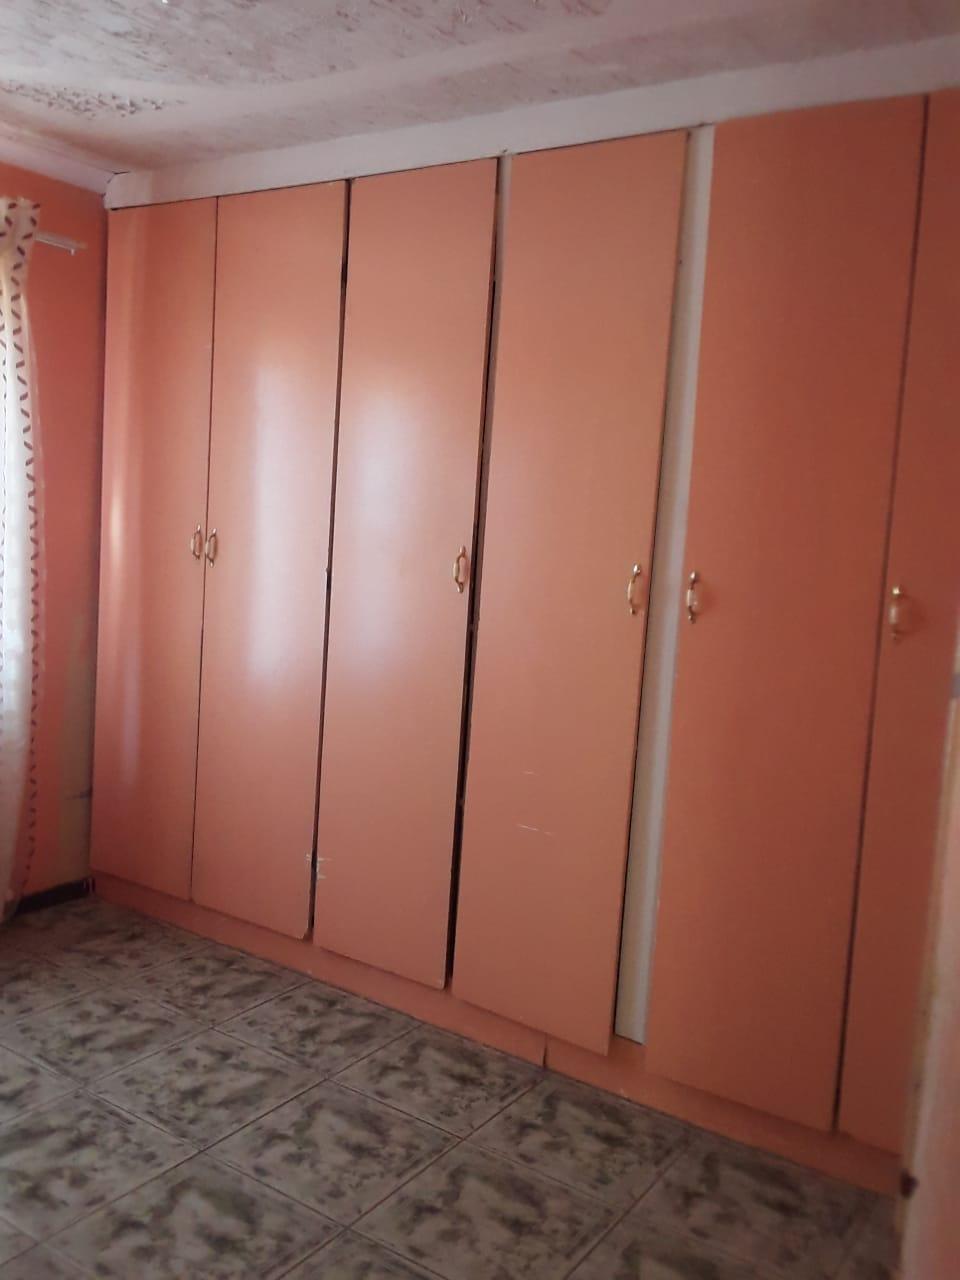 Unit 14 2bed house